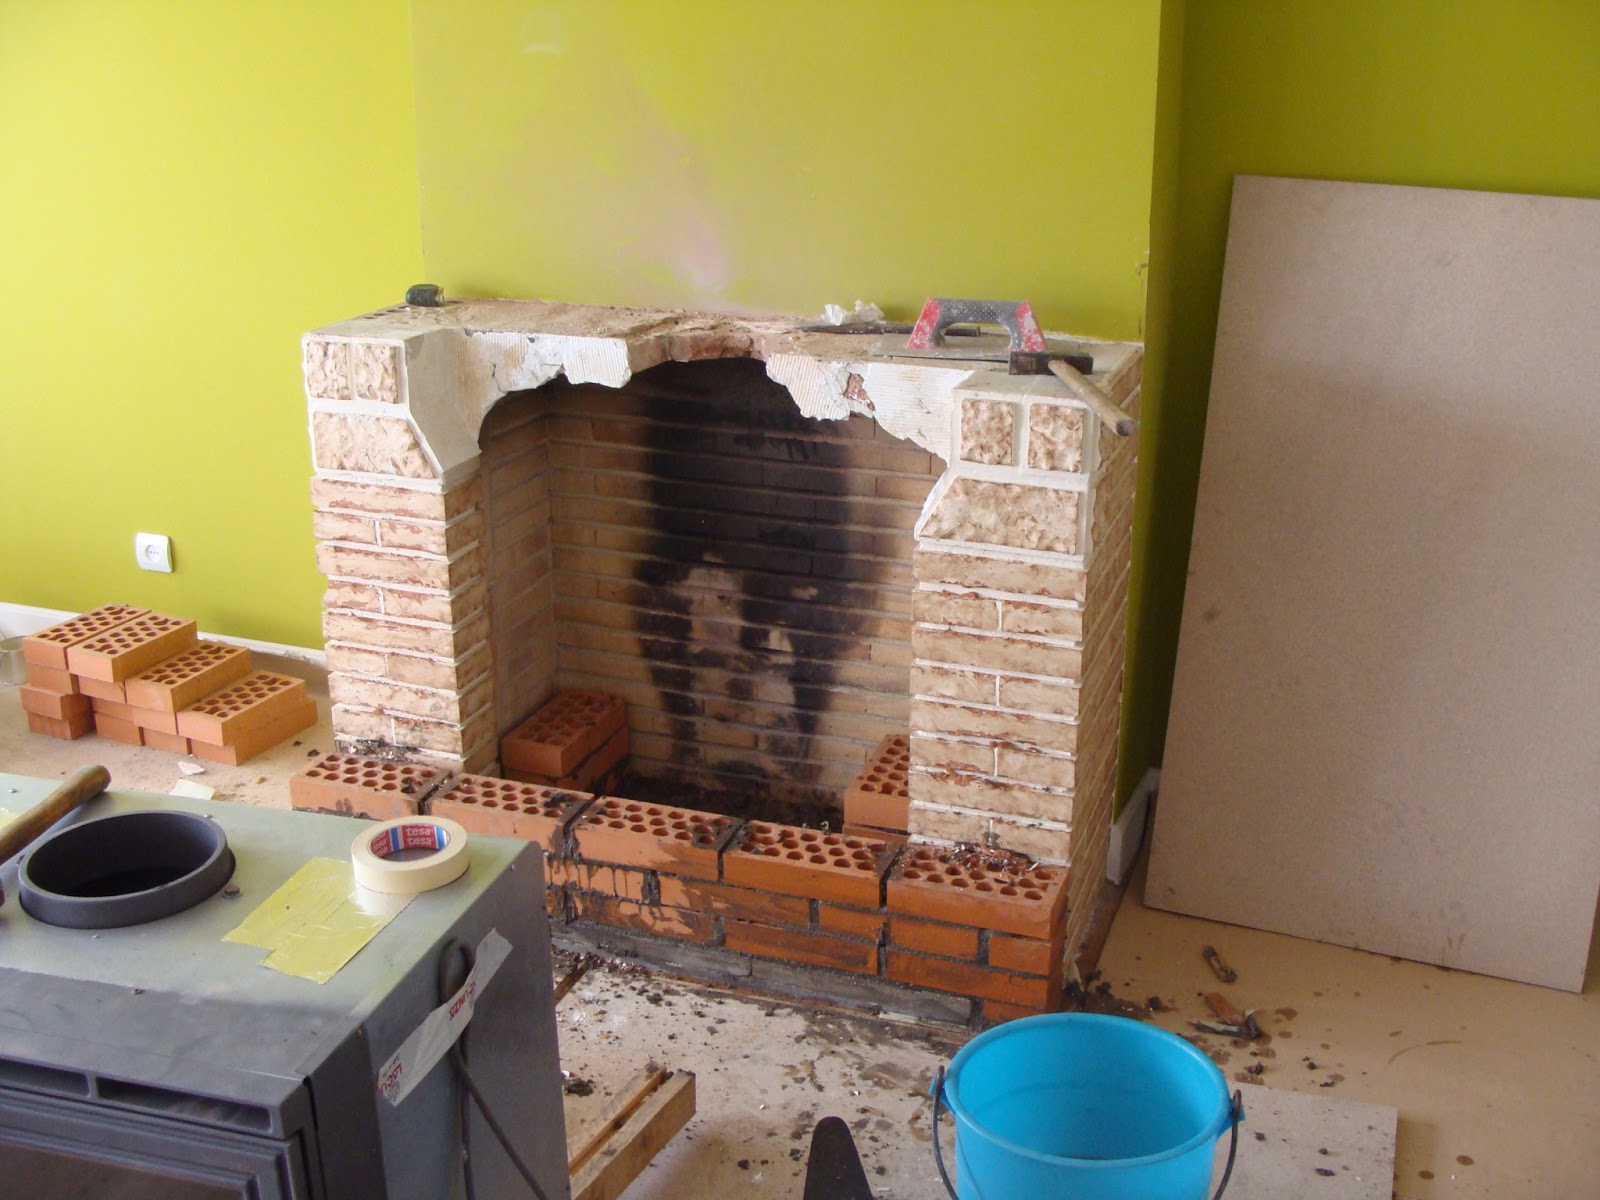 Andocarpinteando montaje de chimenea y reducci n de - Chimenea hace humo solucion ...